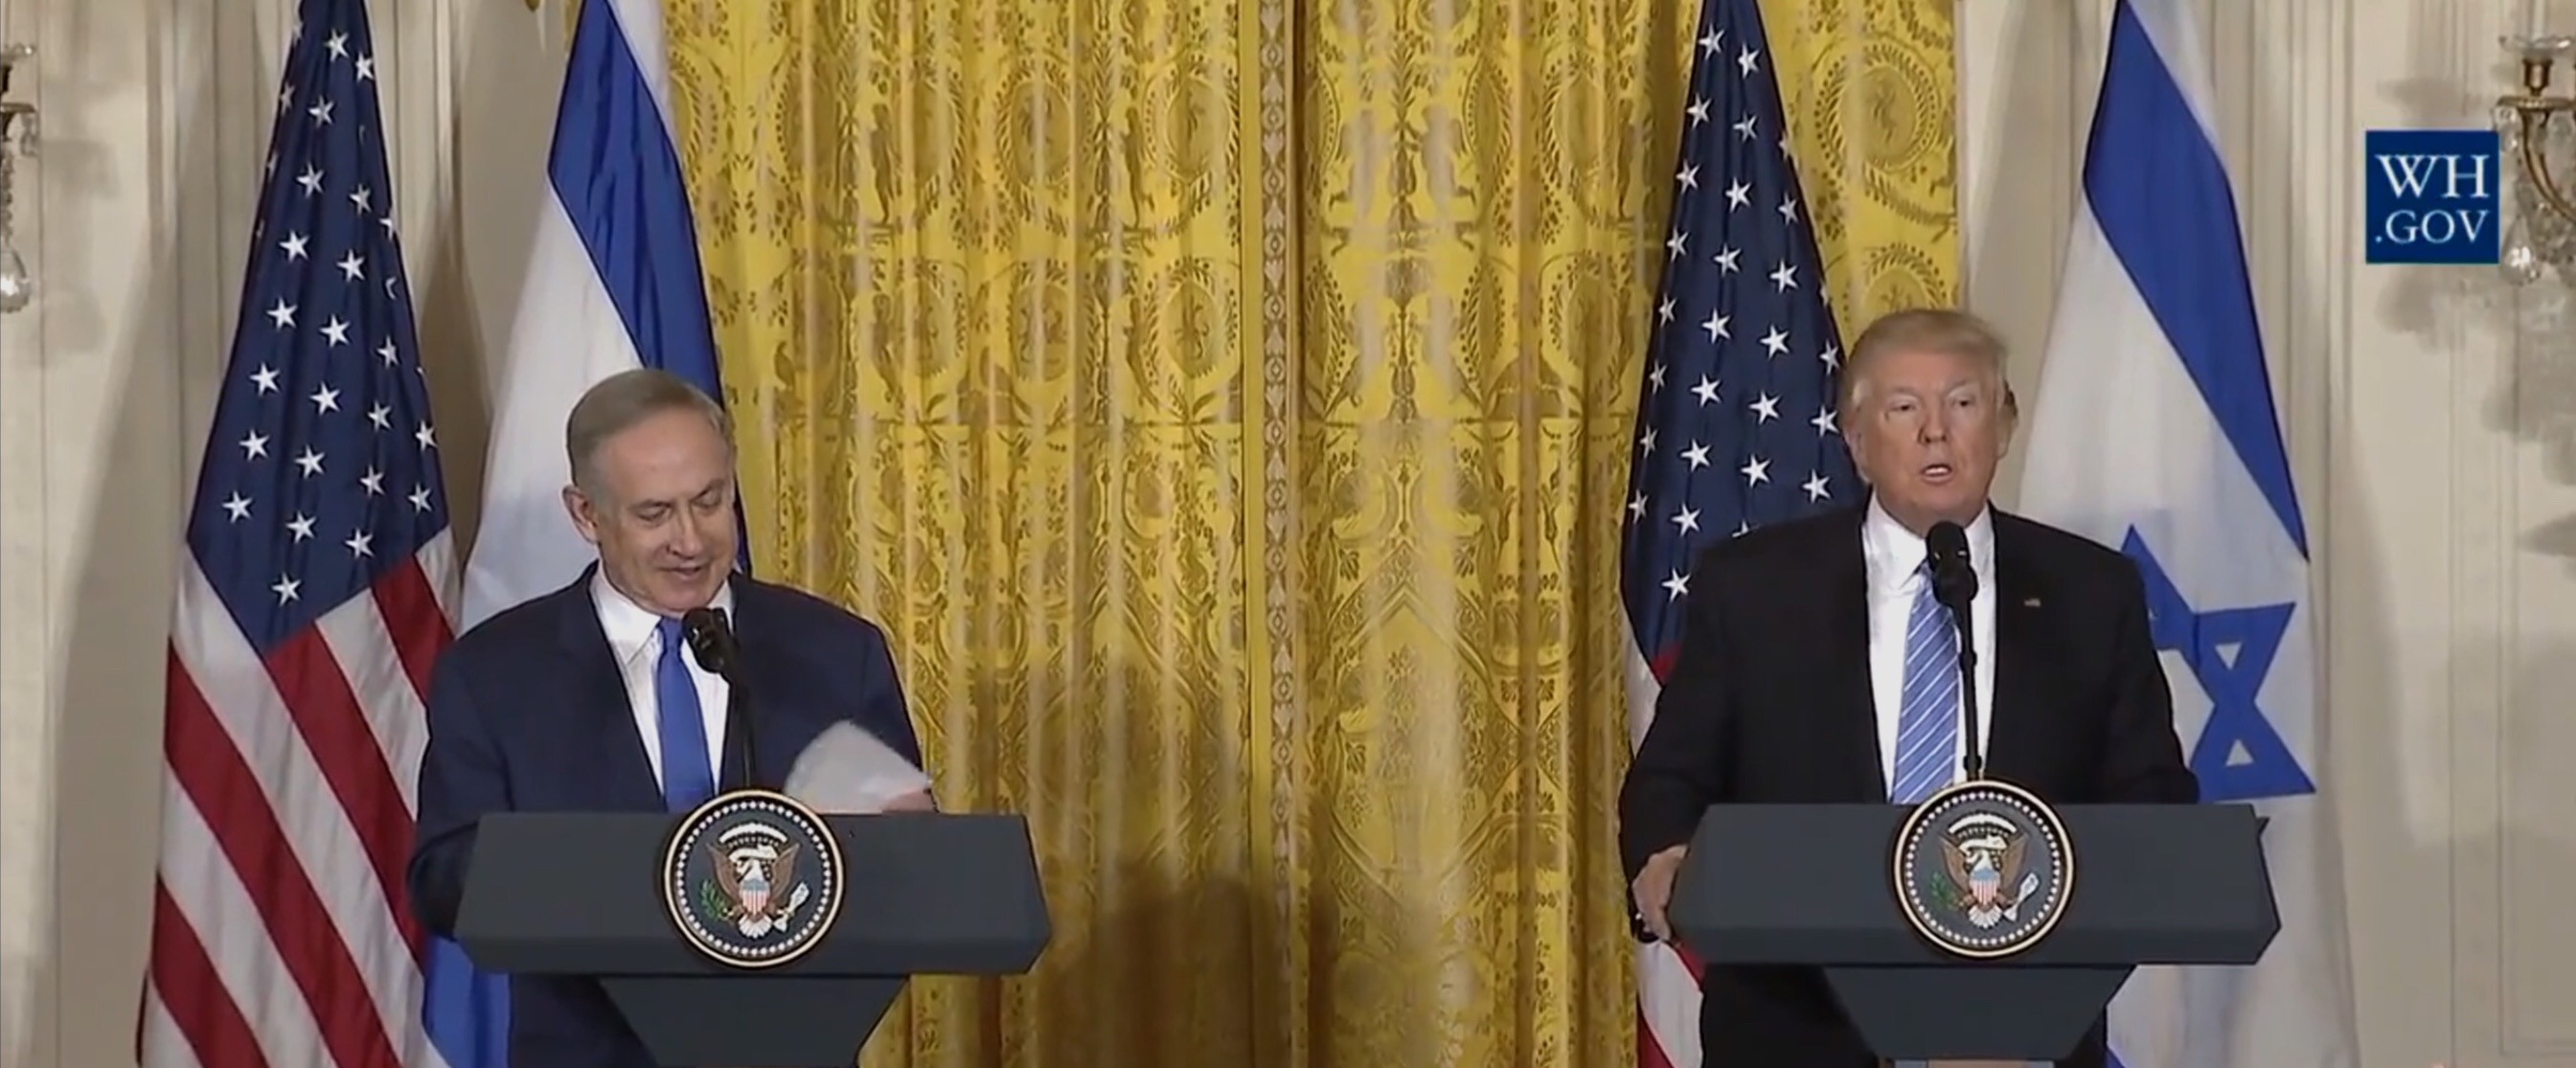 Trump-Kushner Multigenerational Family Friend Interrogated In Corruption Case